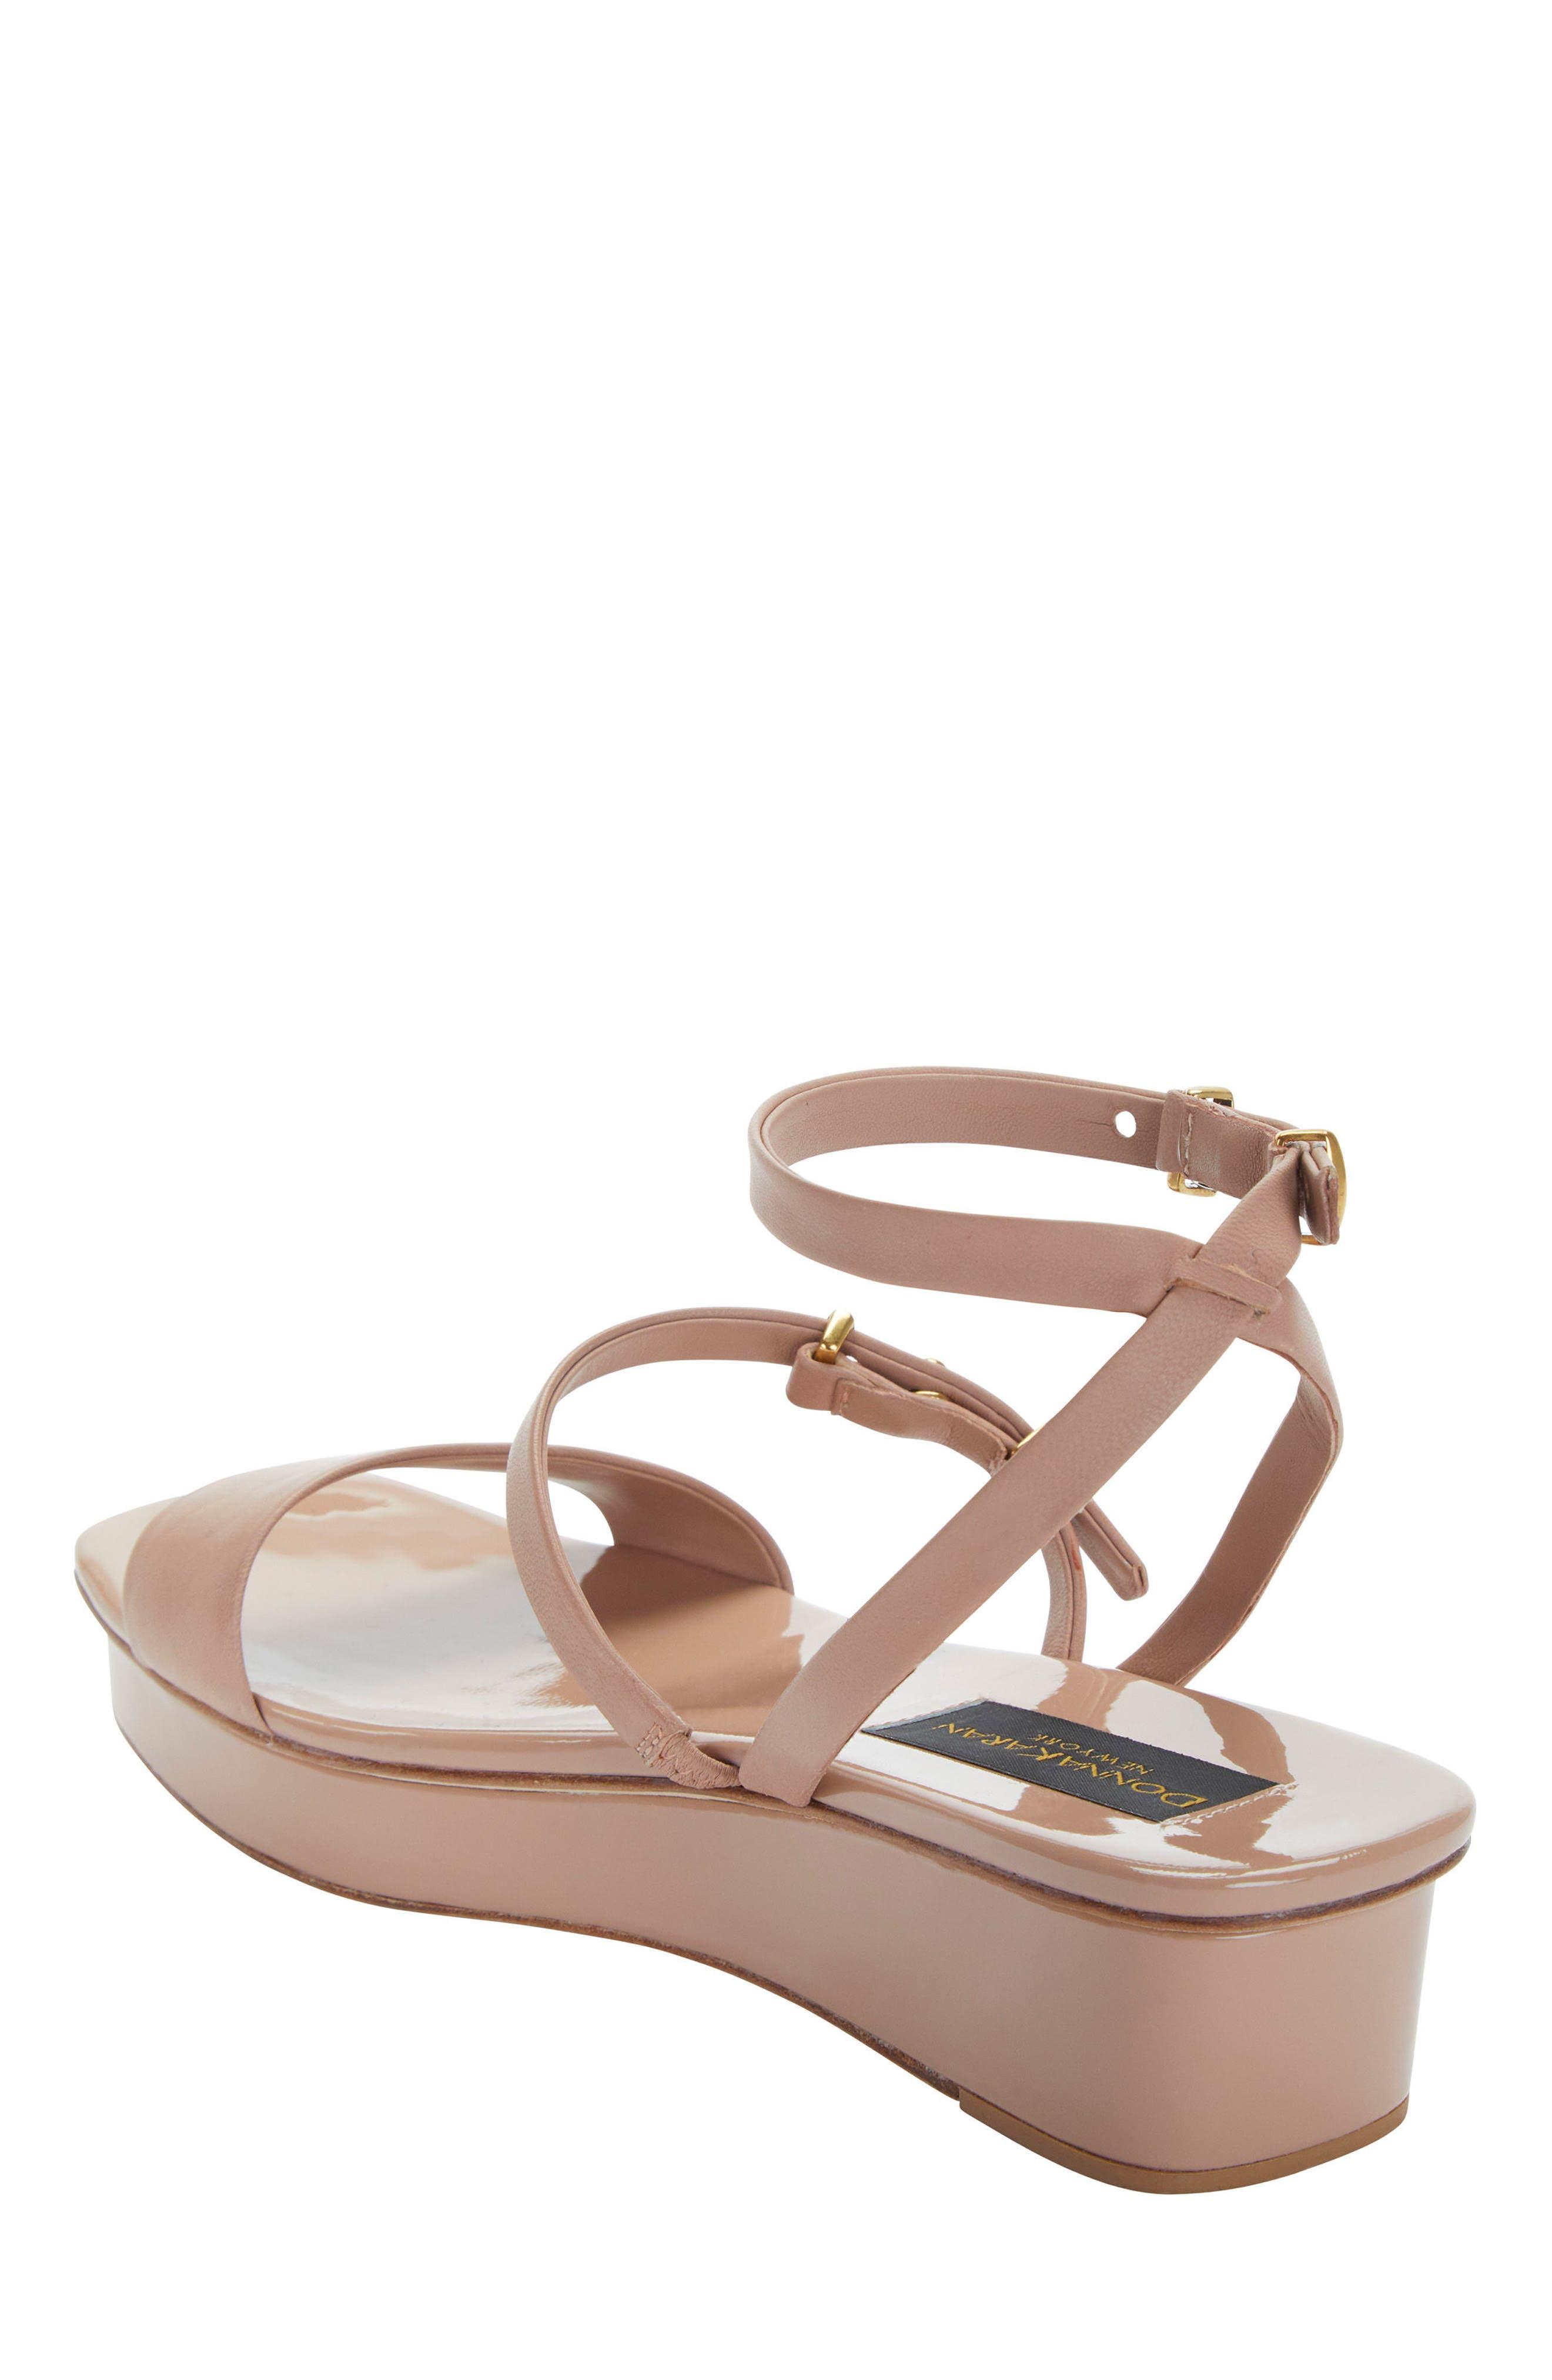 Ankle Strap Wedge Sandal,                             Alternate thumbnail 4, color,